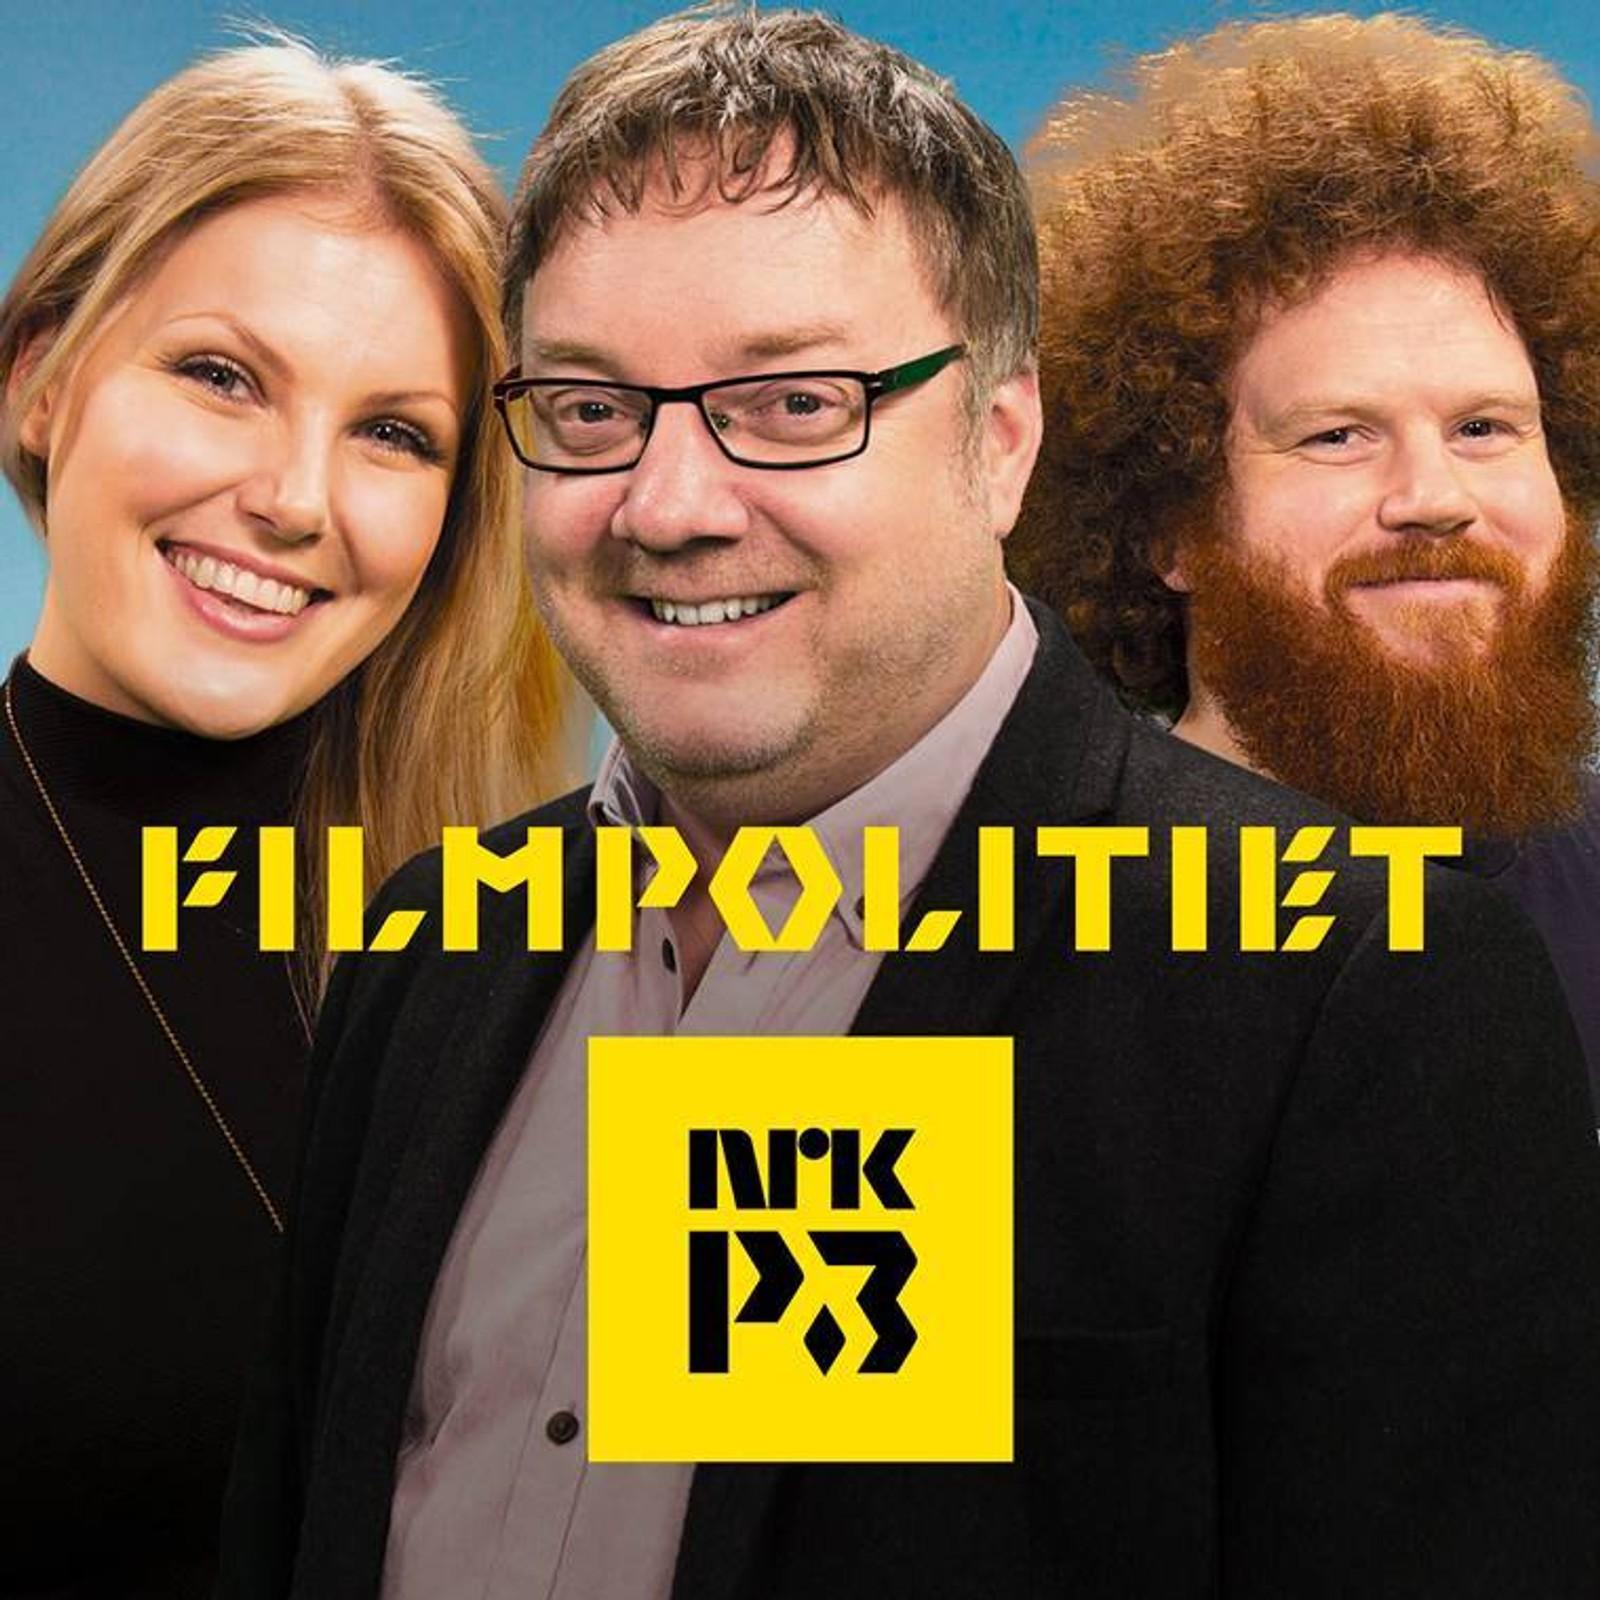 Filmpolitiet